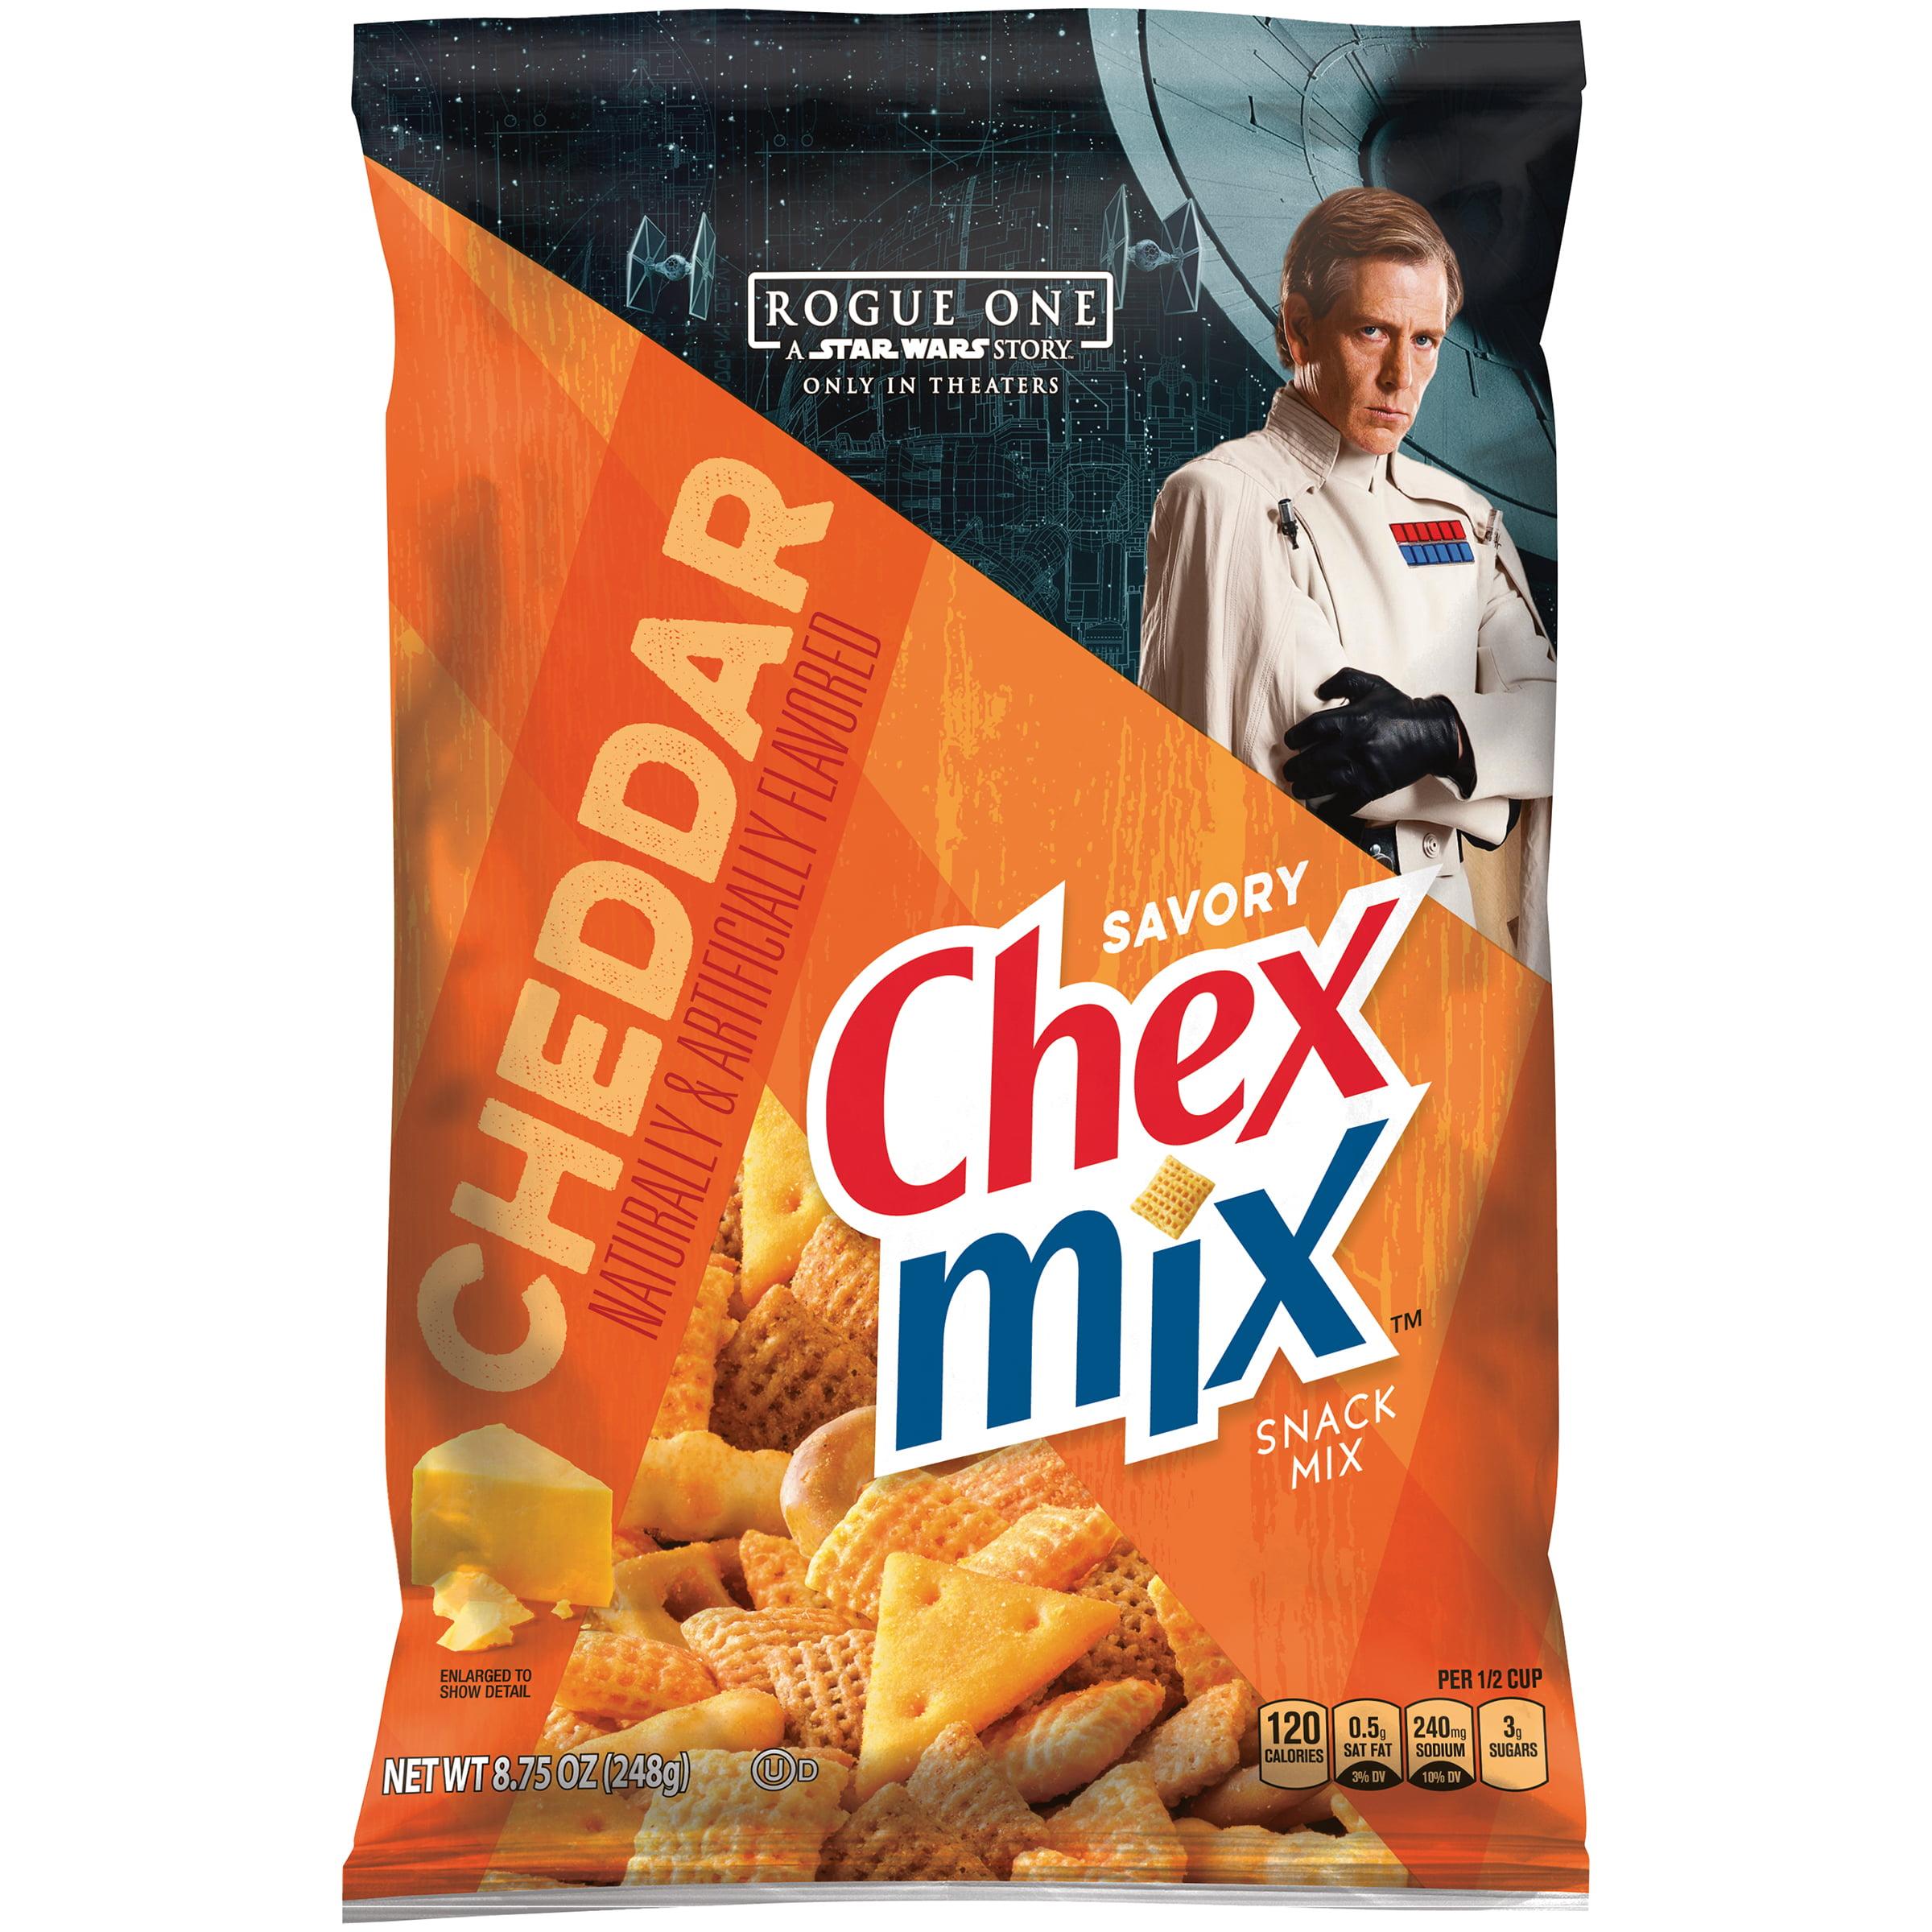 Chex Mix��� Savory Cheddar Snack Mix 8.75 oz. Box